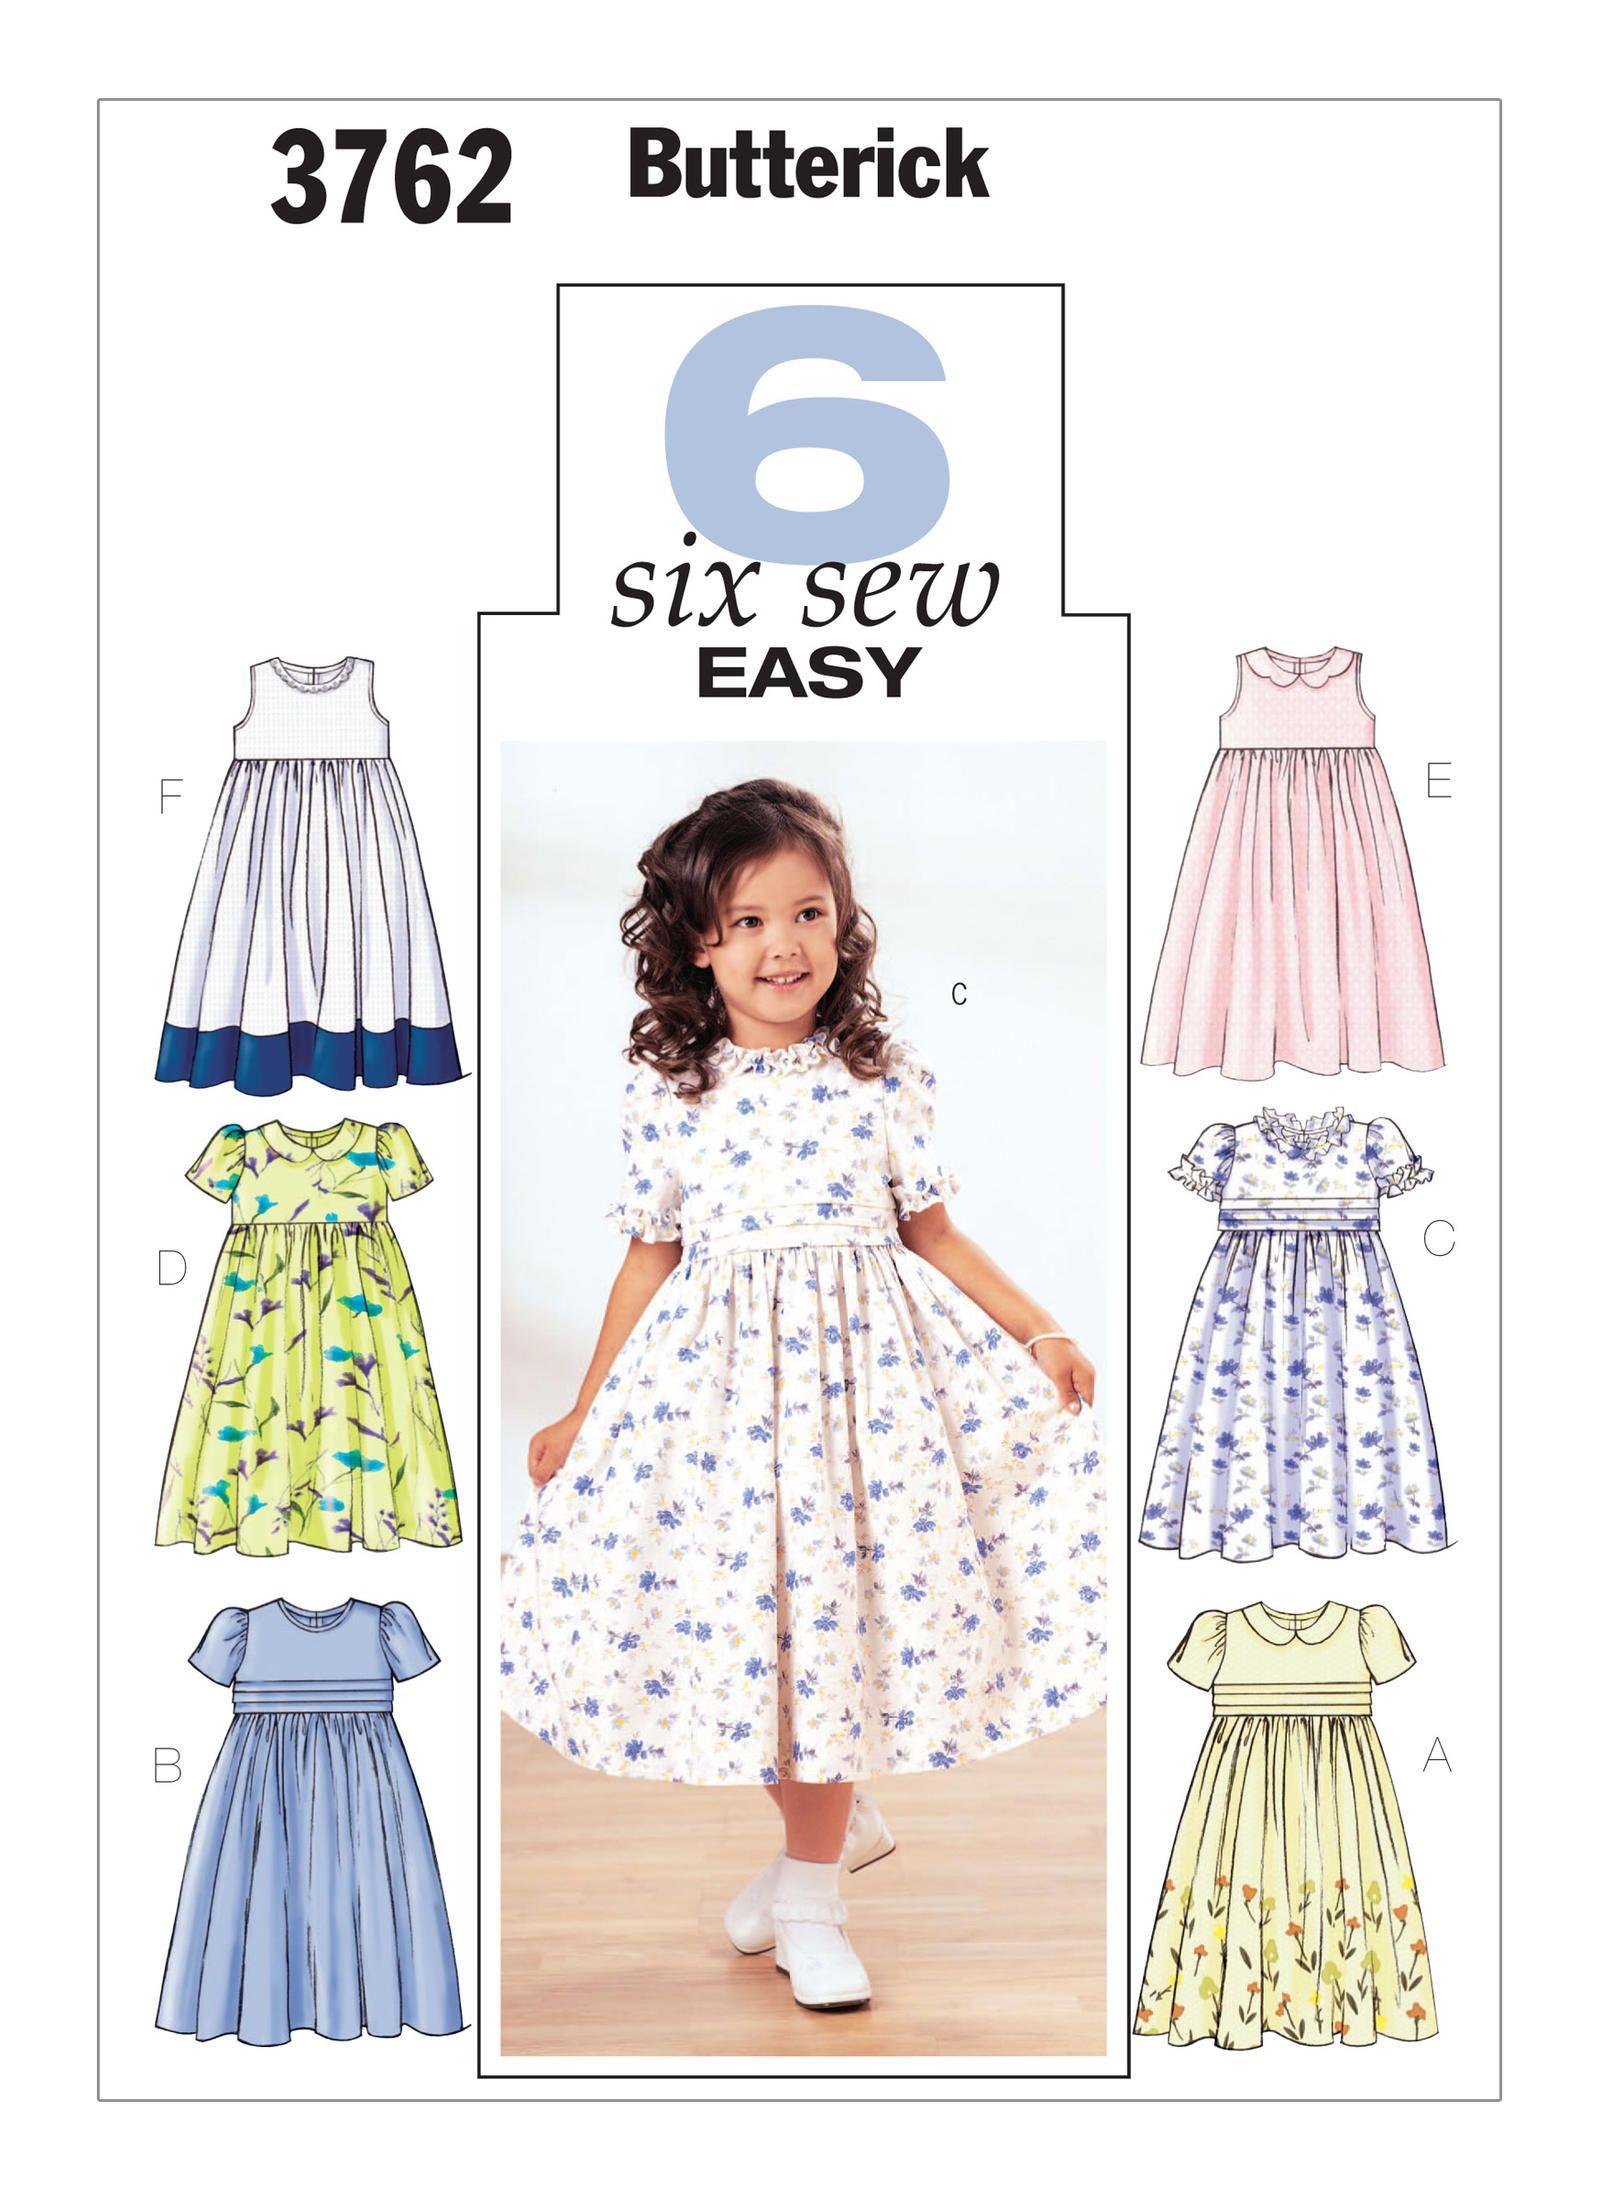 B3762 butterick patterns childrens and girls empire waist butterick sewing pattern childrens and girls empire waist dresses jeuxipadfo Gallery